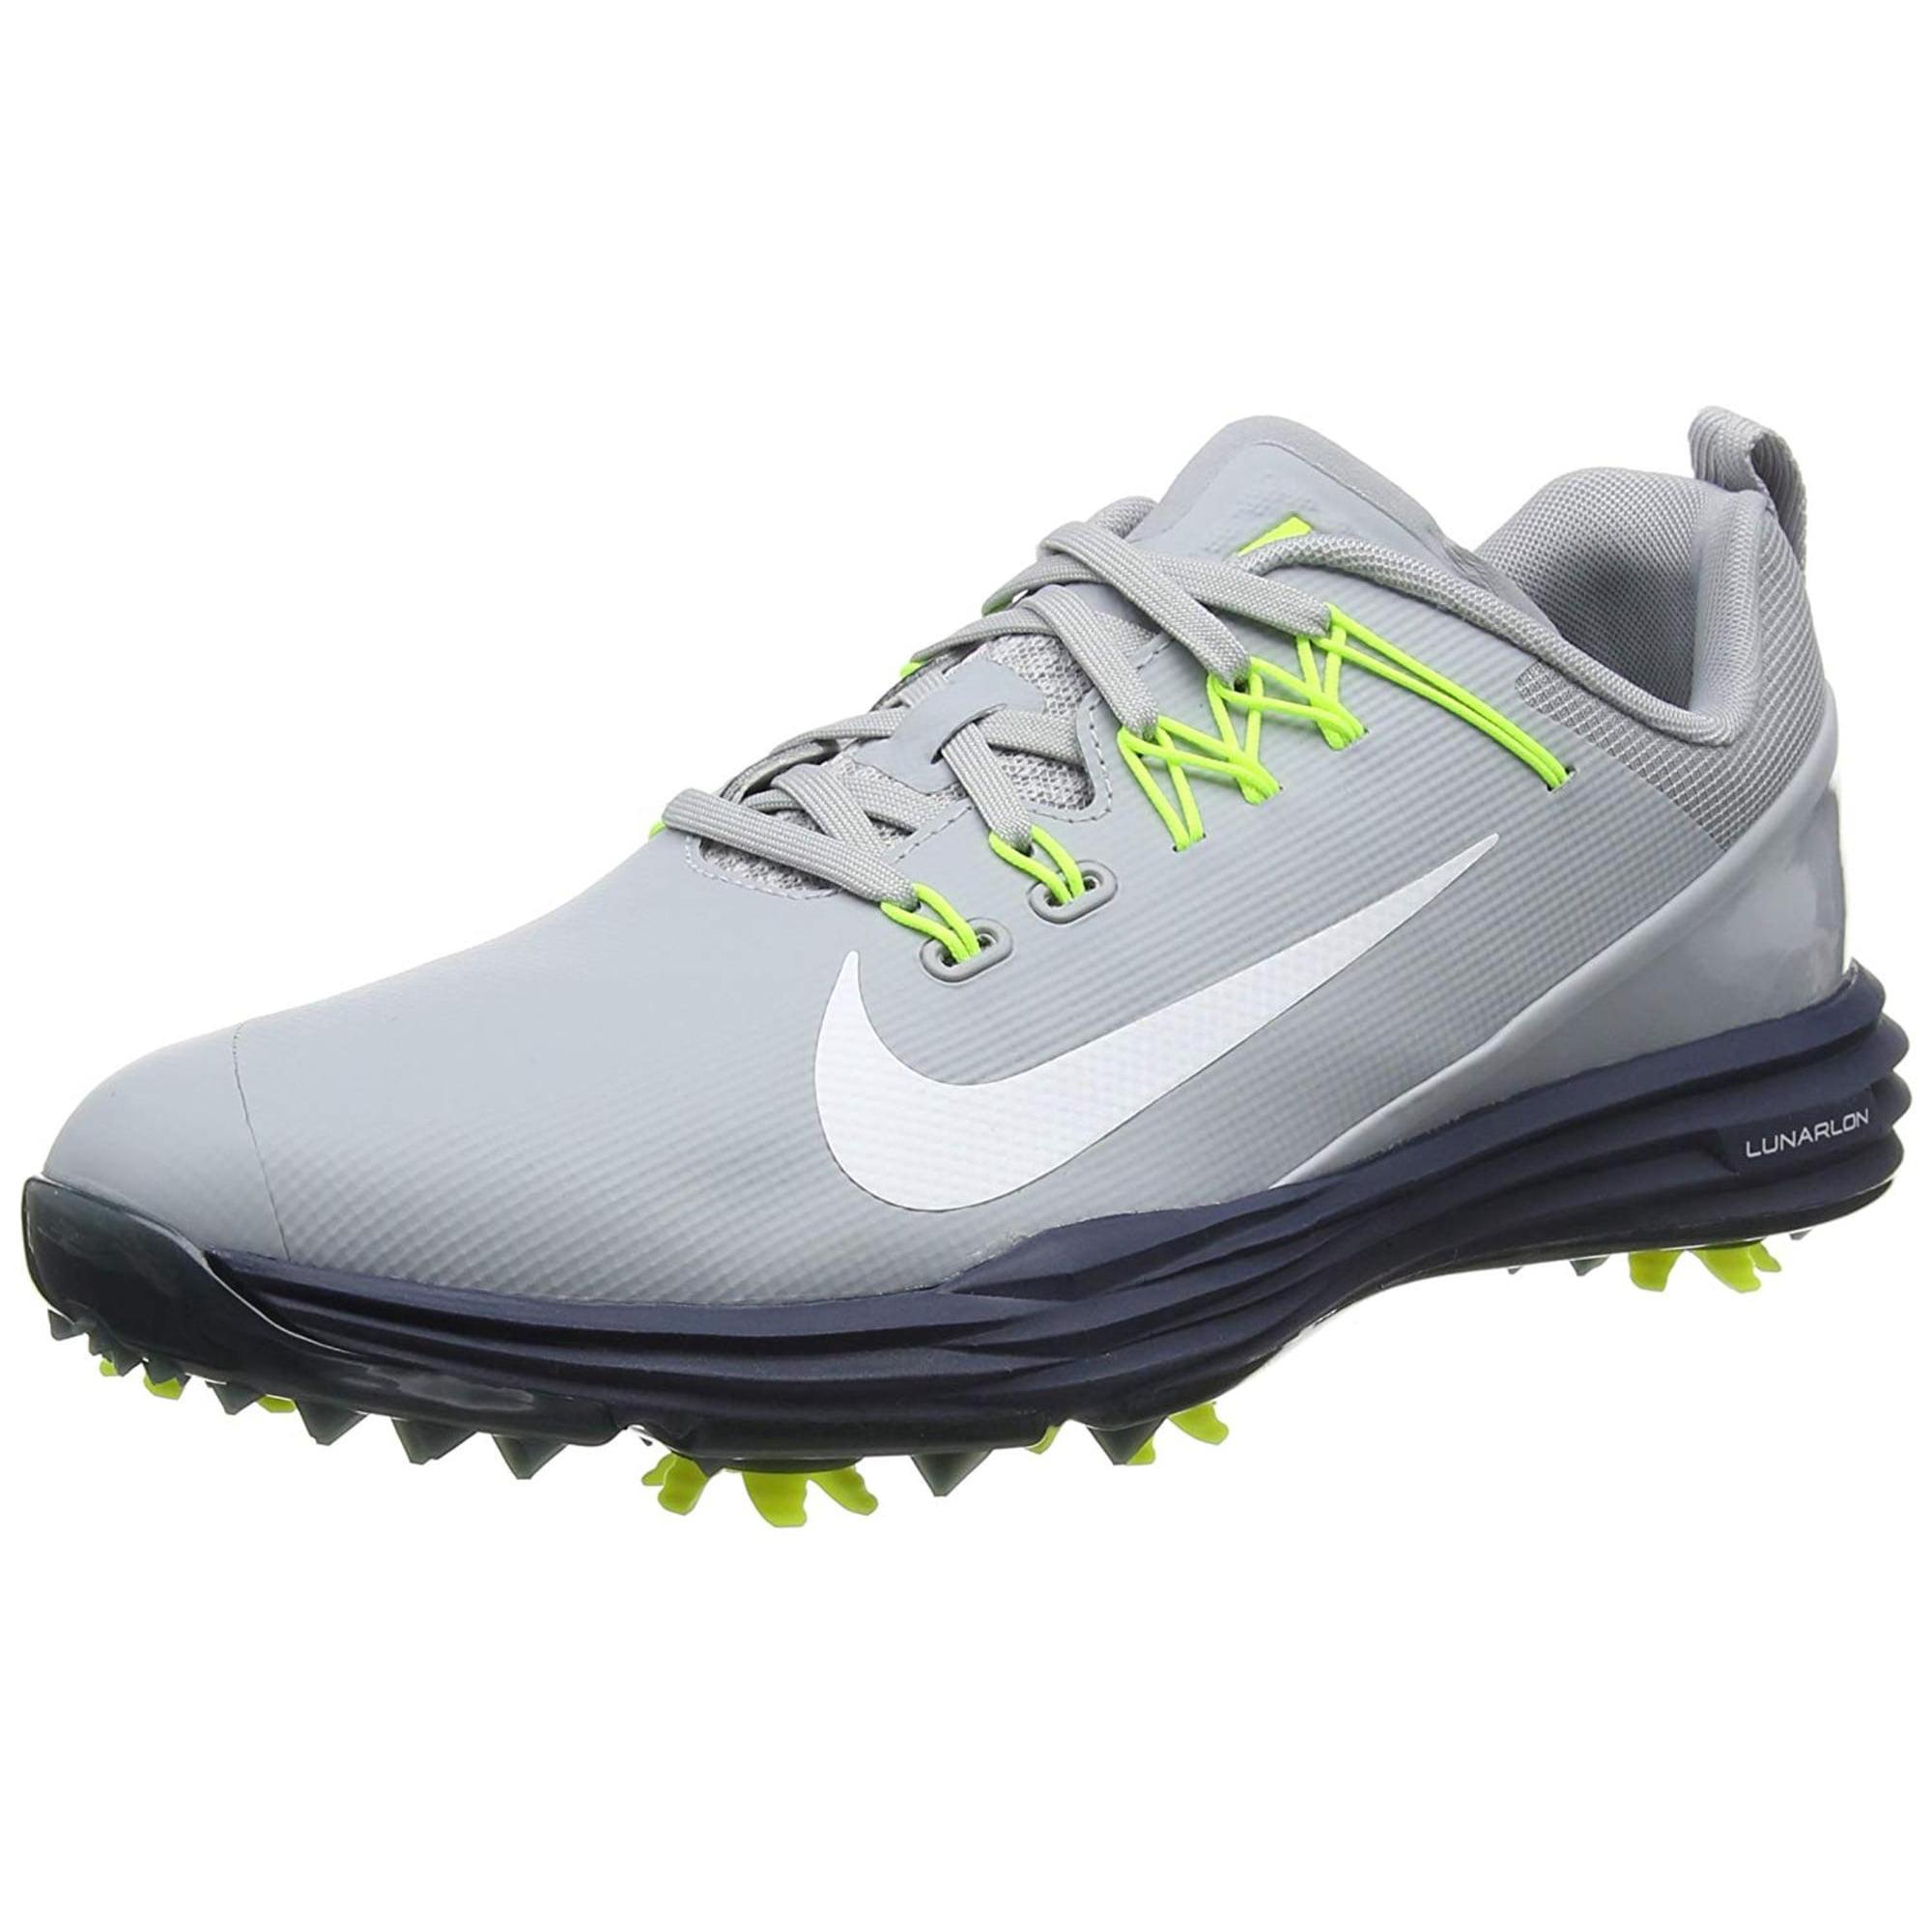 573ba5135c54 NIKE Men s Lunar Command 2 Golf Shoe